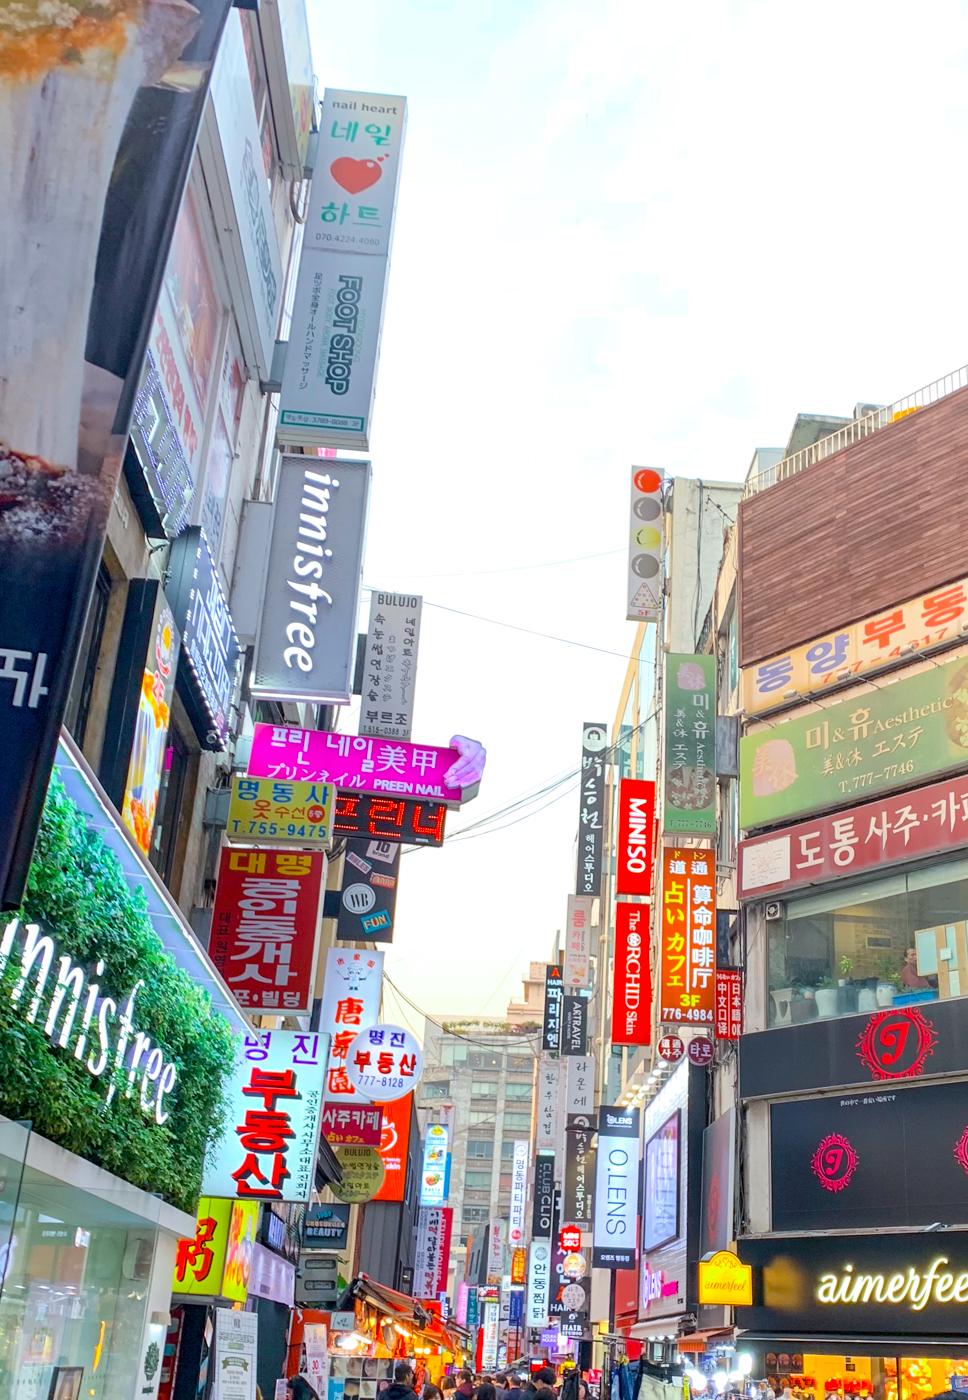 Myeongdong Korean Beauty Shopping | Seoul, Korea Travel Guide | The Chic Diary